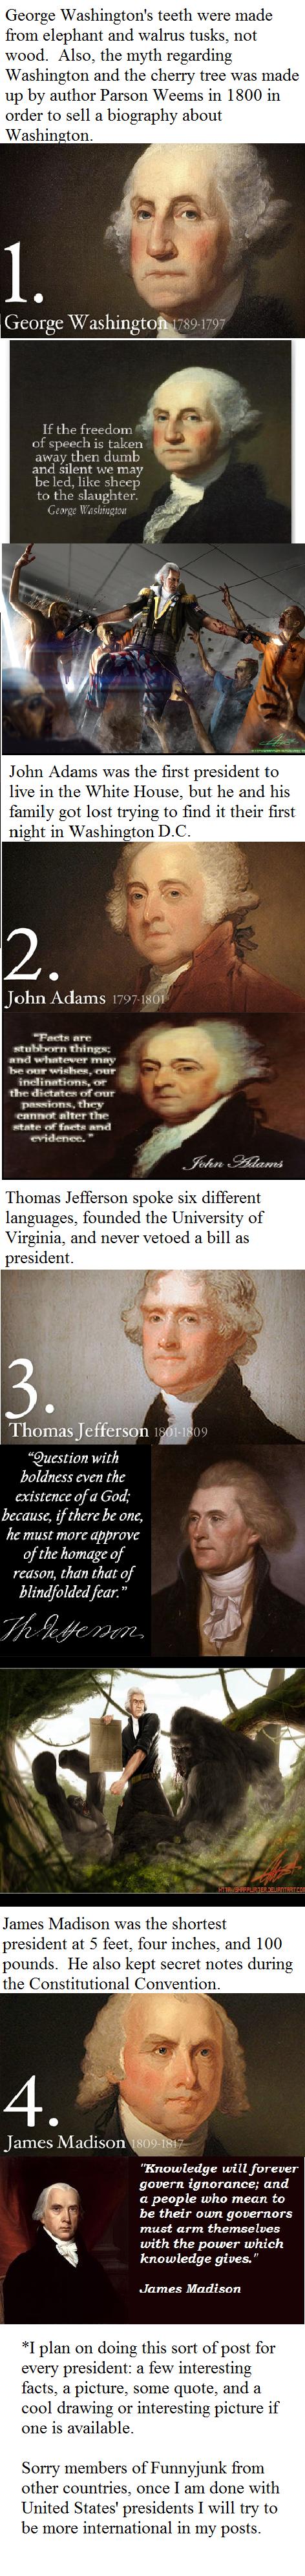 History Time - U.S. Presidents one. United States Presidents 1. George Washington 2. John Adams 3. Thomas Jefferson 4. James Madison.. No need to apologize. I find this interesting, nonetheless.